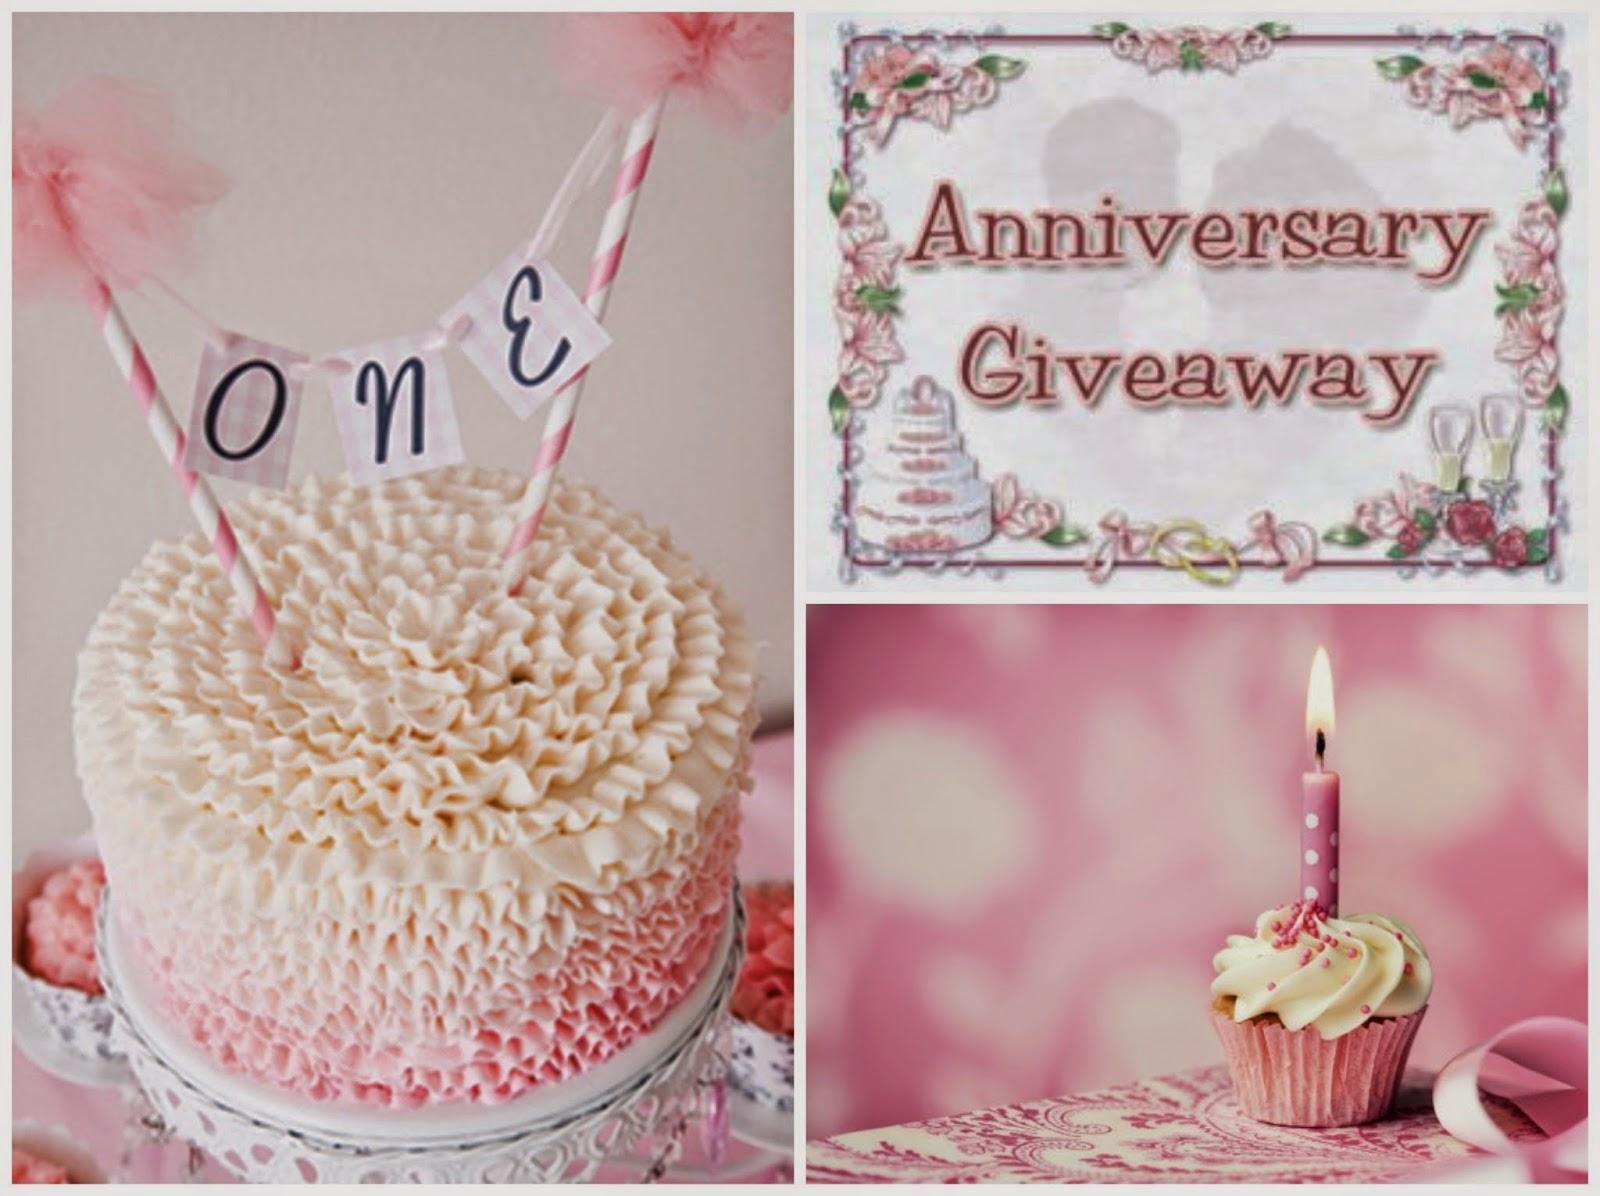 10000 Reasons Of Joy : Grand Anniversary Giveaway Winners image